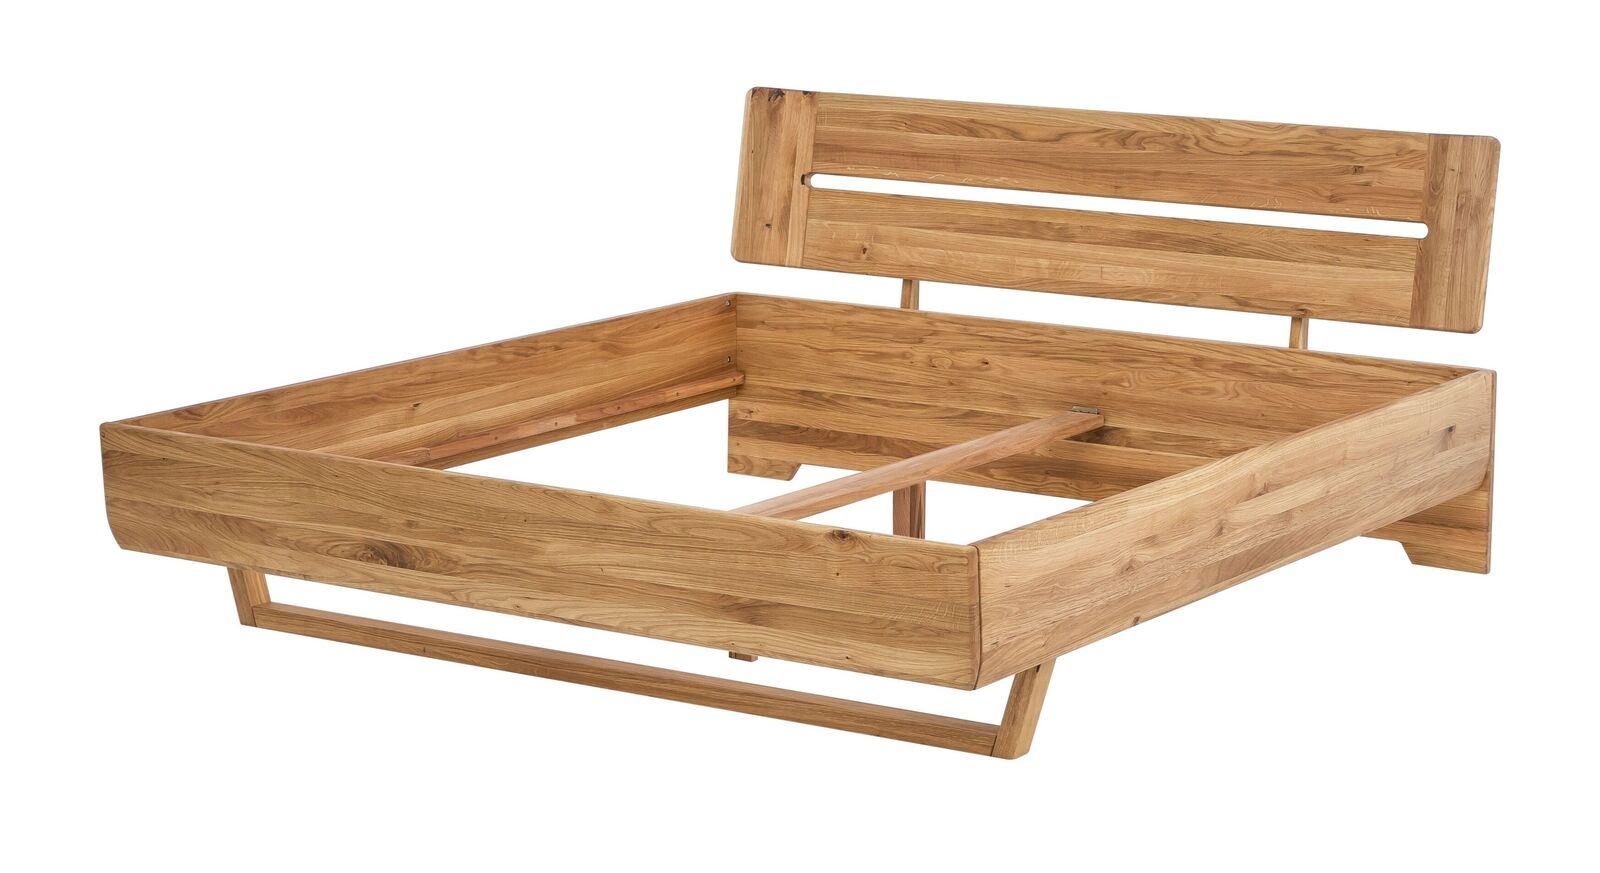 Bett Bekan mit robustem Massivholz-Rahmen